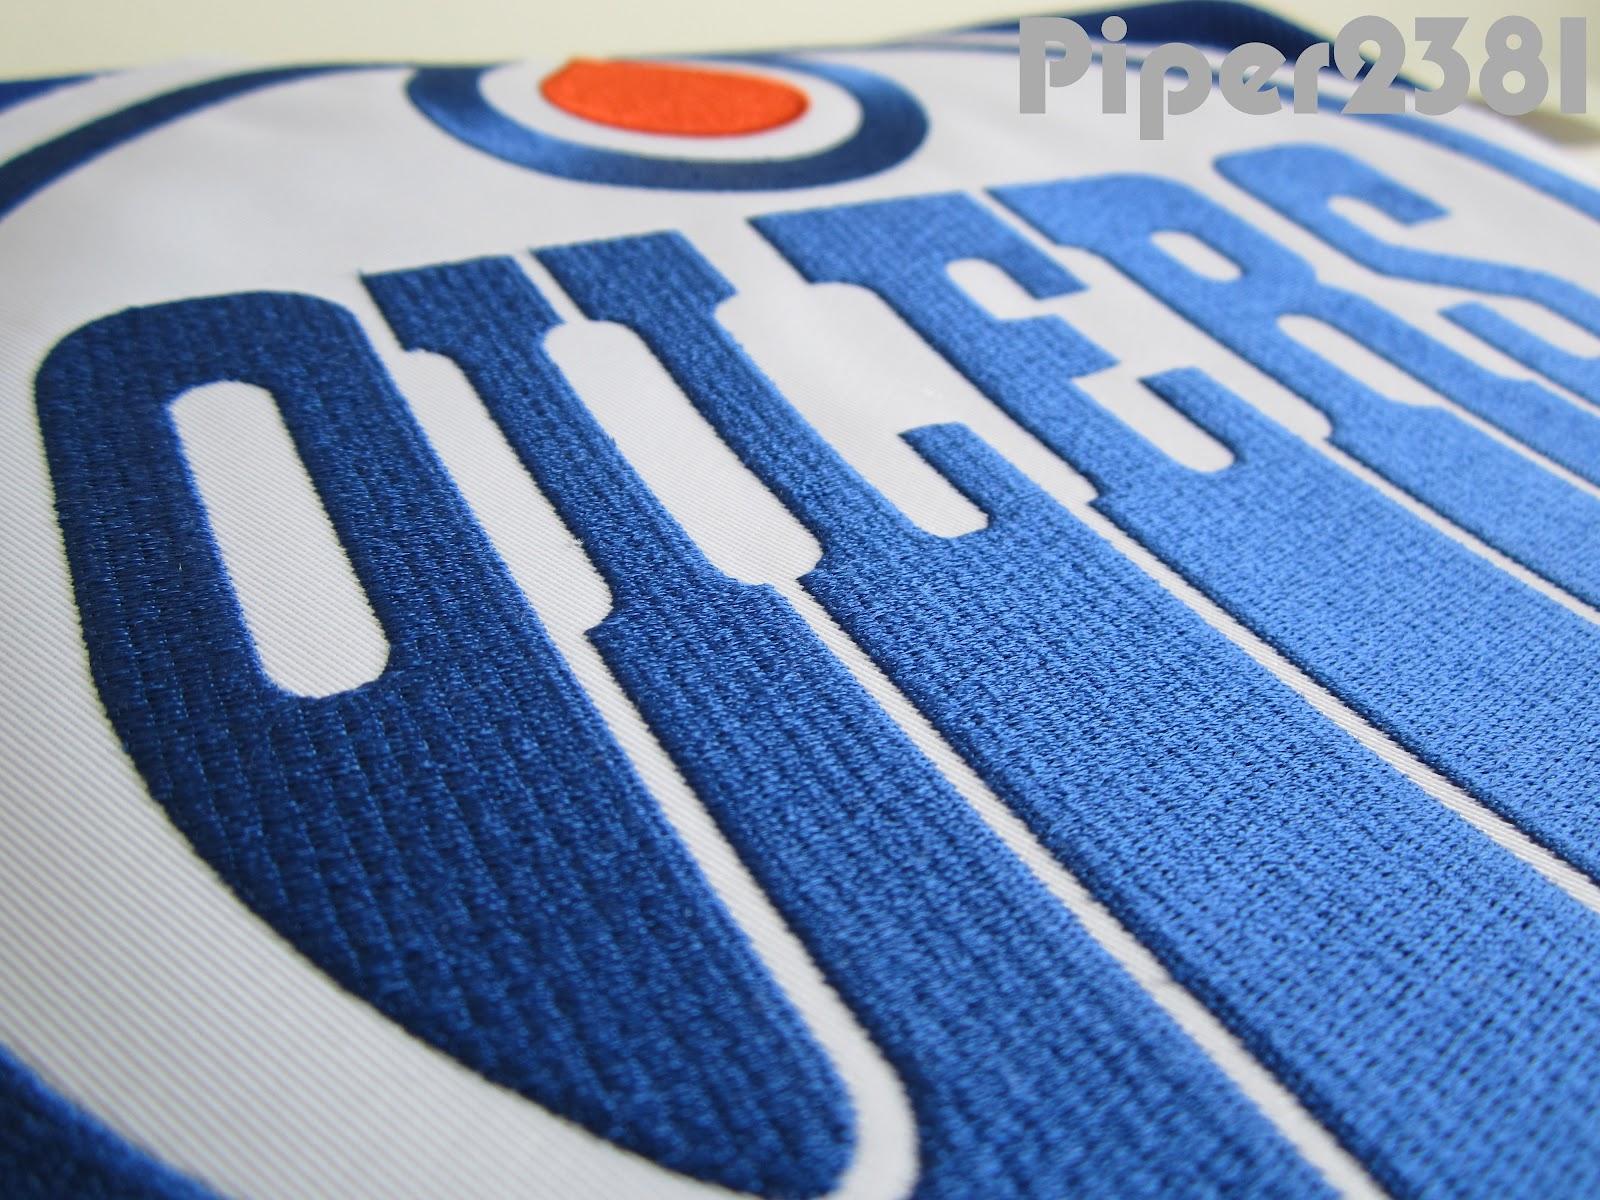 Piper2381 Edmonton Oilers Jersey 1600x1200